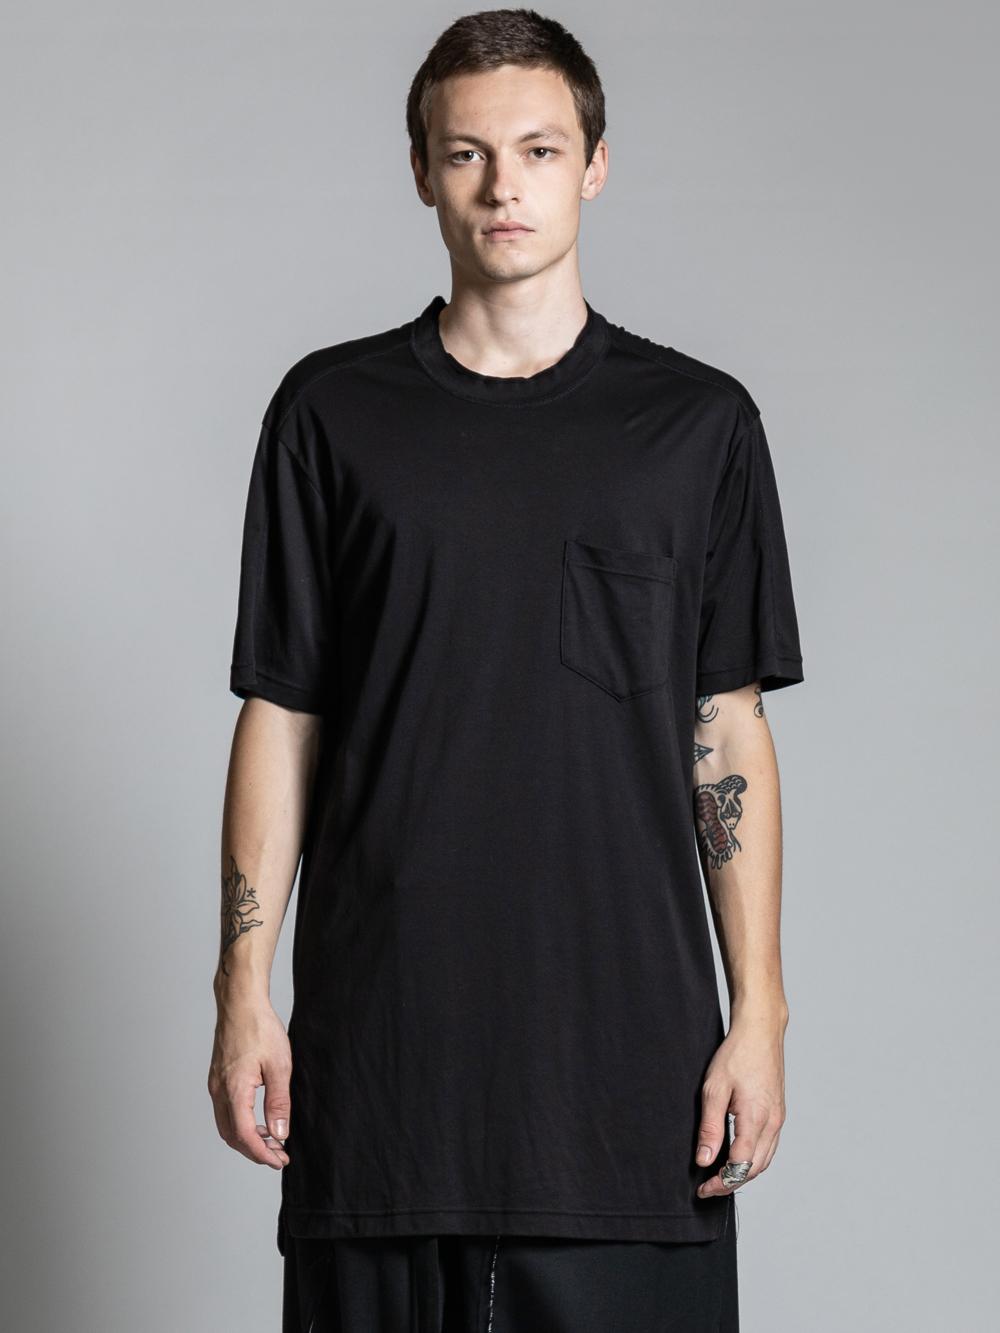 VI-2977-01 / 綿スムース ロング丈 半袖Tシャツ